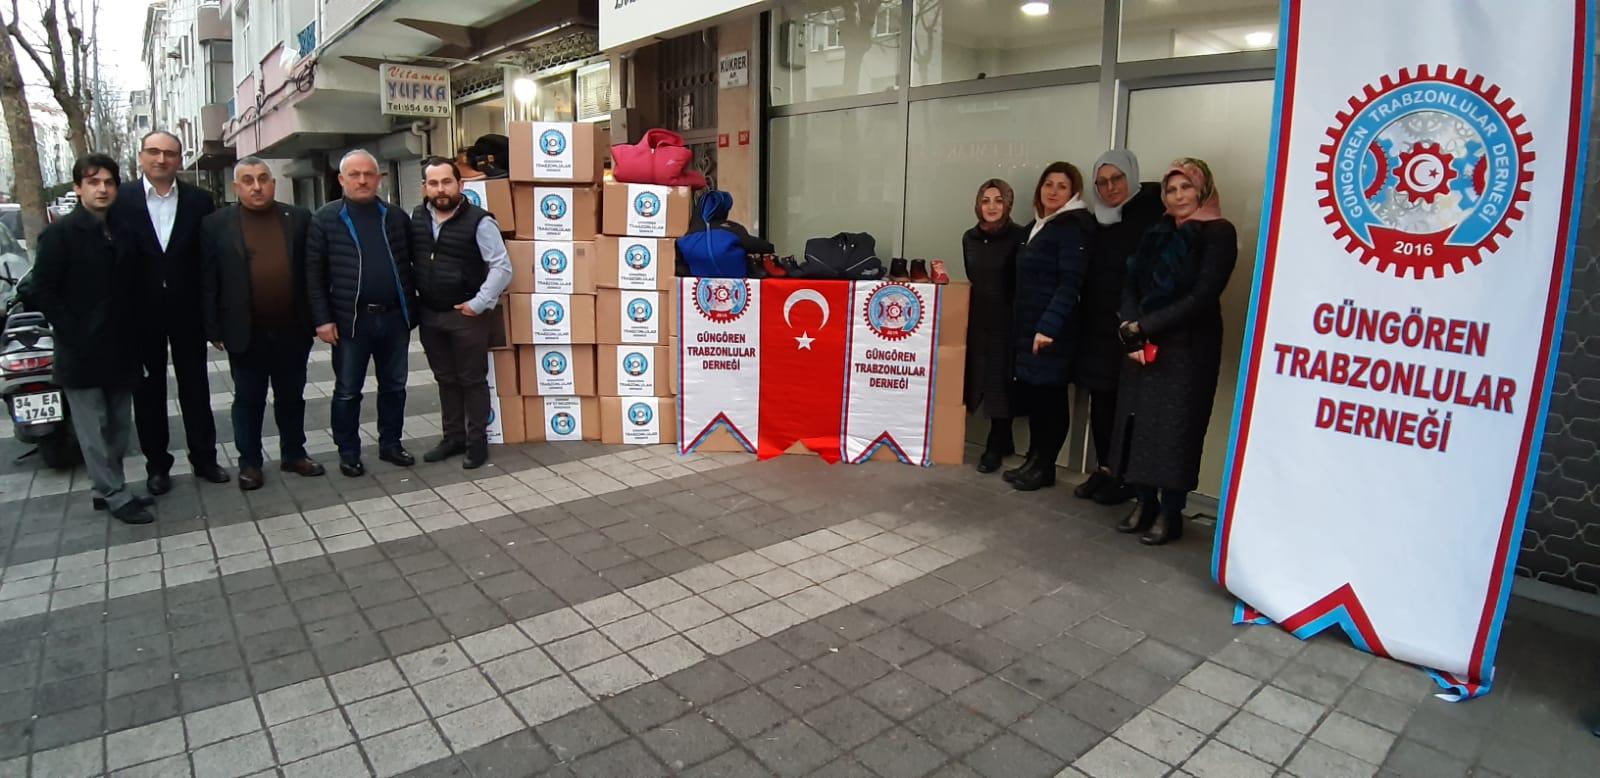 Güngören Trabzonlular